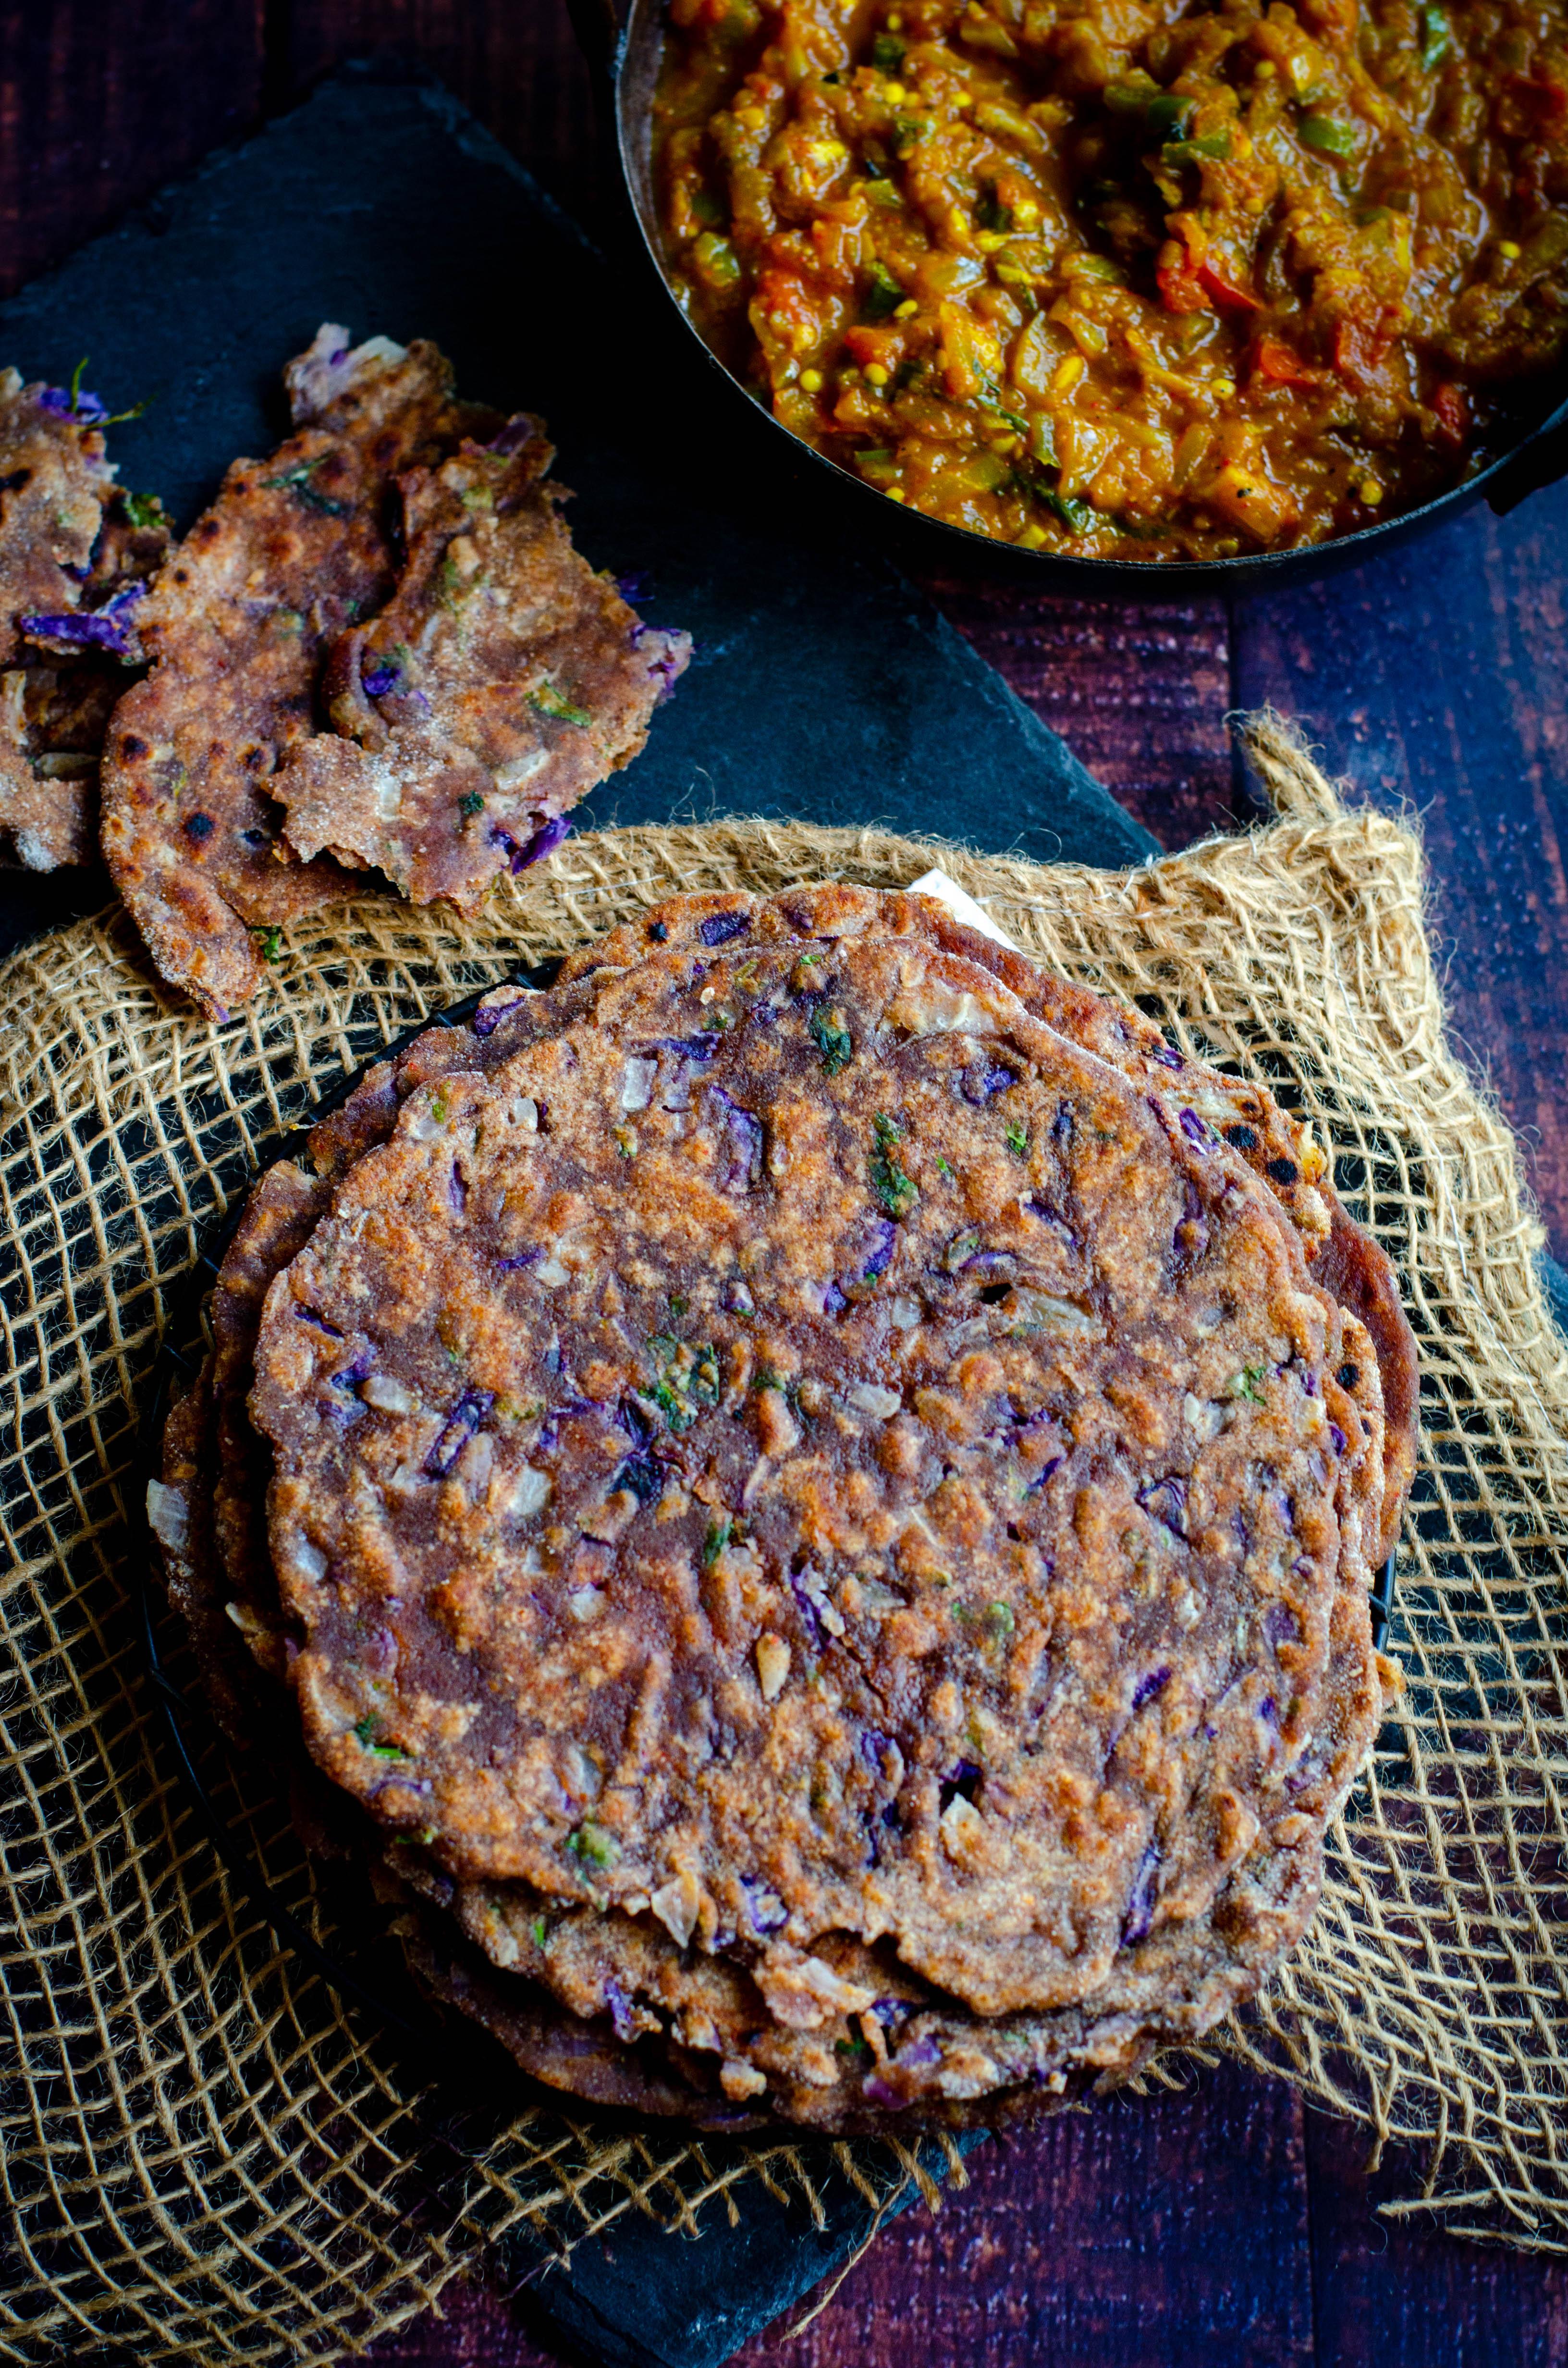 Ragi chapati with purple cabbage stacked and served with baingan bartha